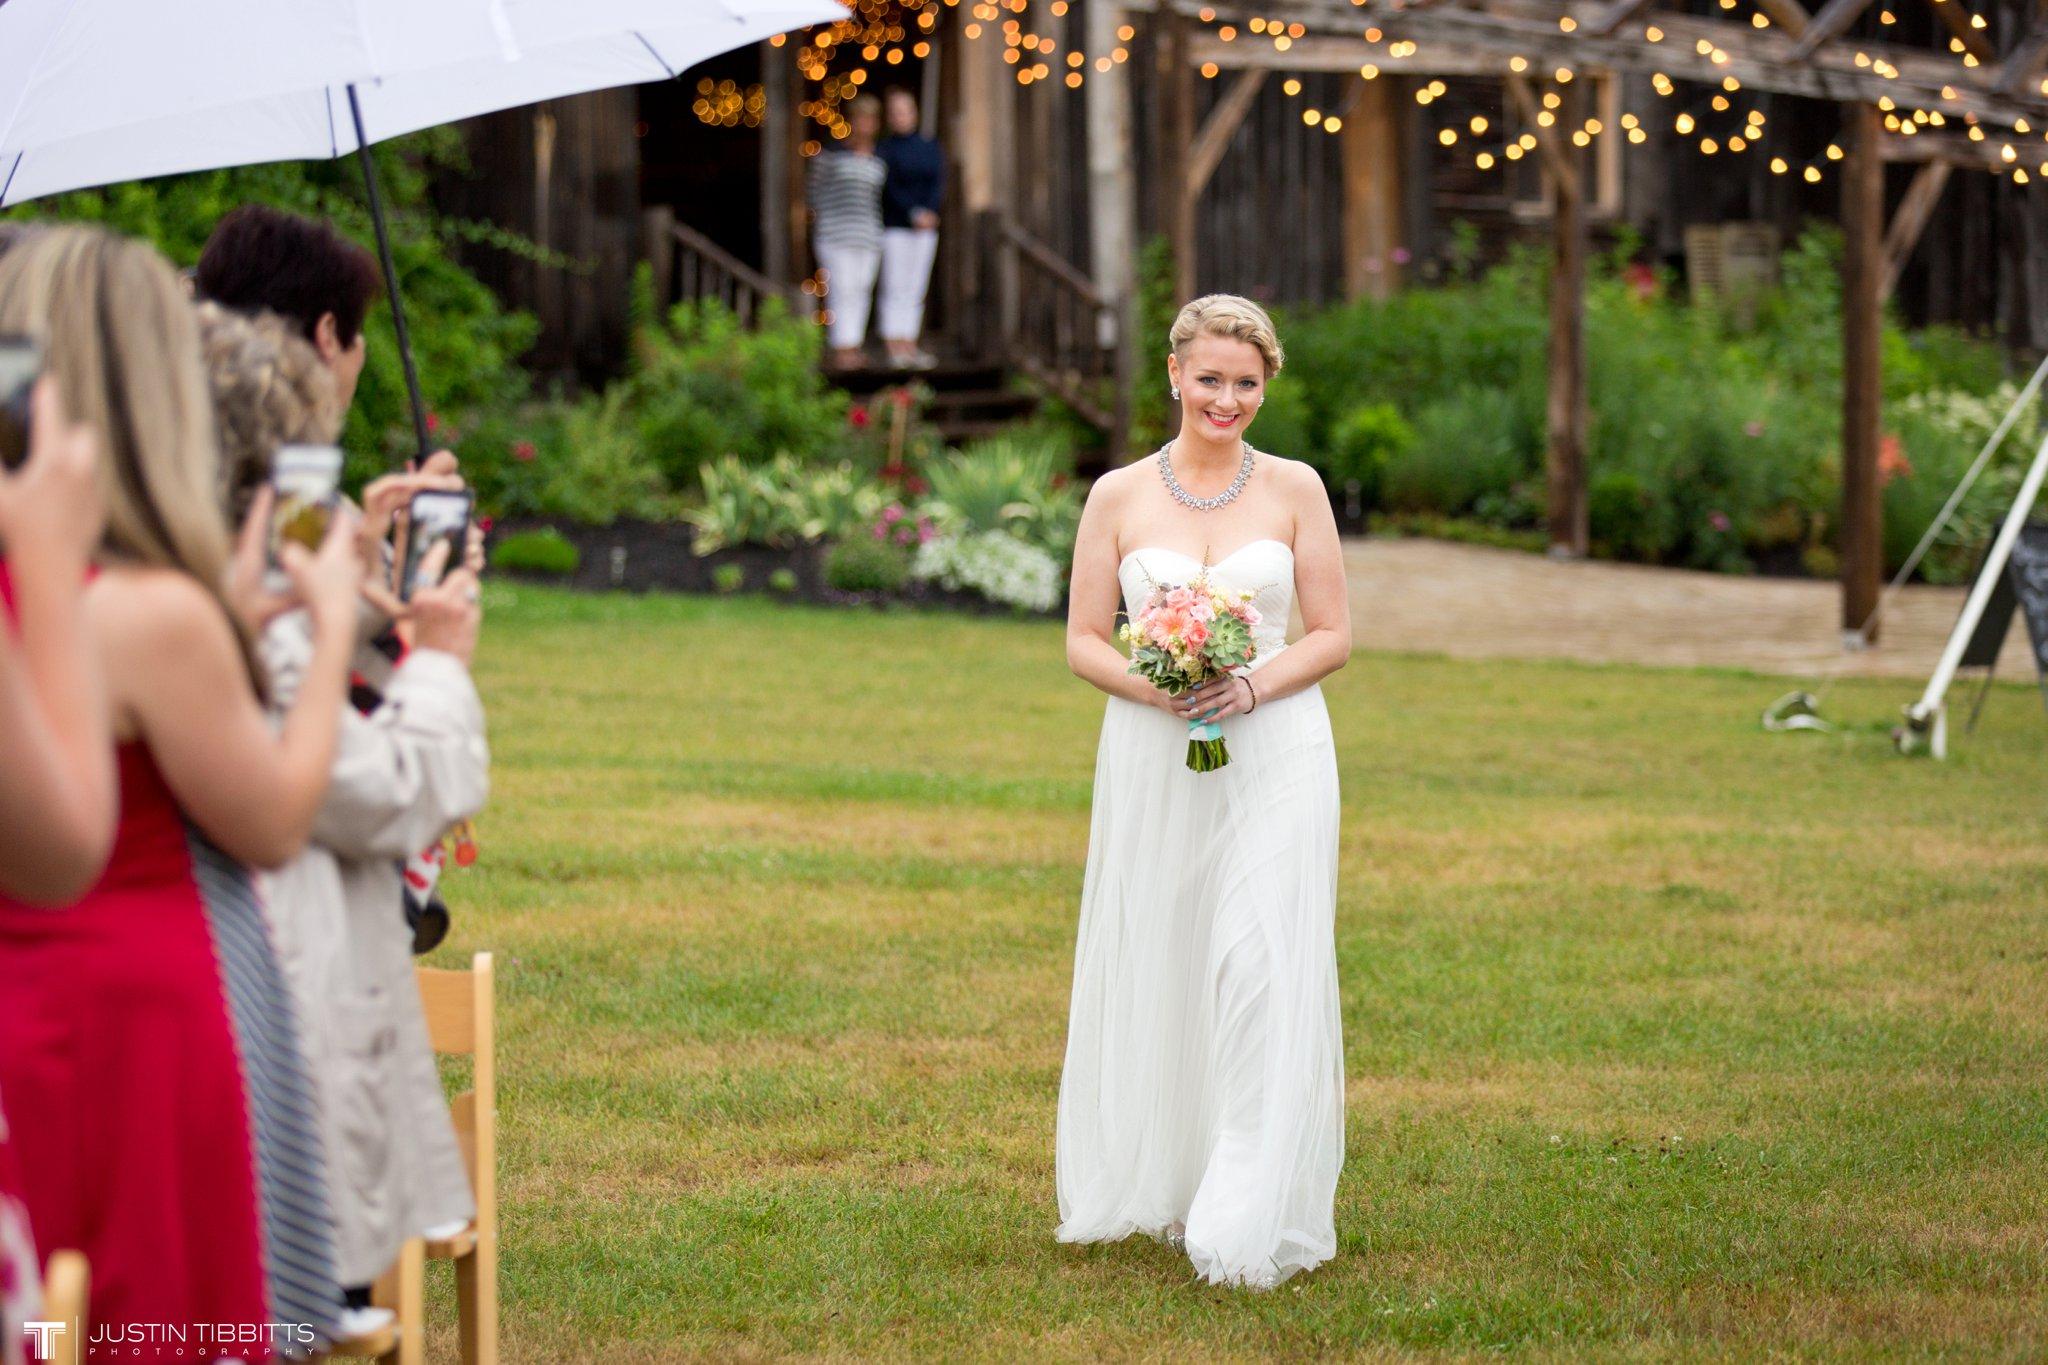 burlap-and-beams-wedding-photos-with-joran-and-molly_0054